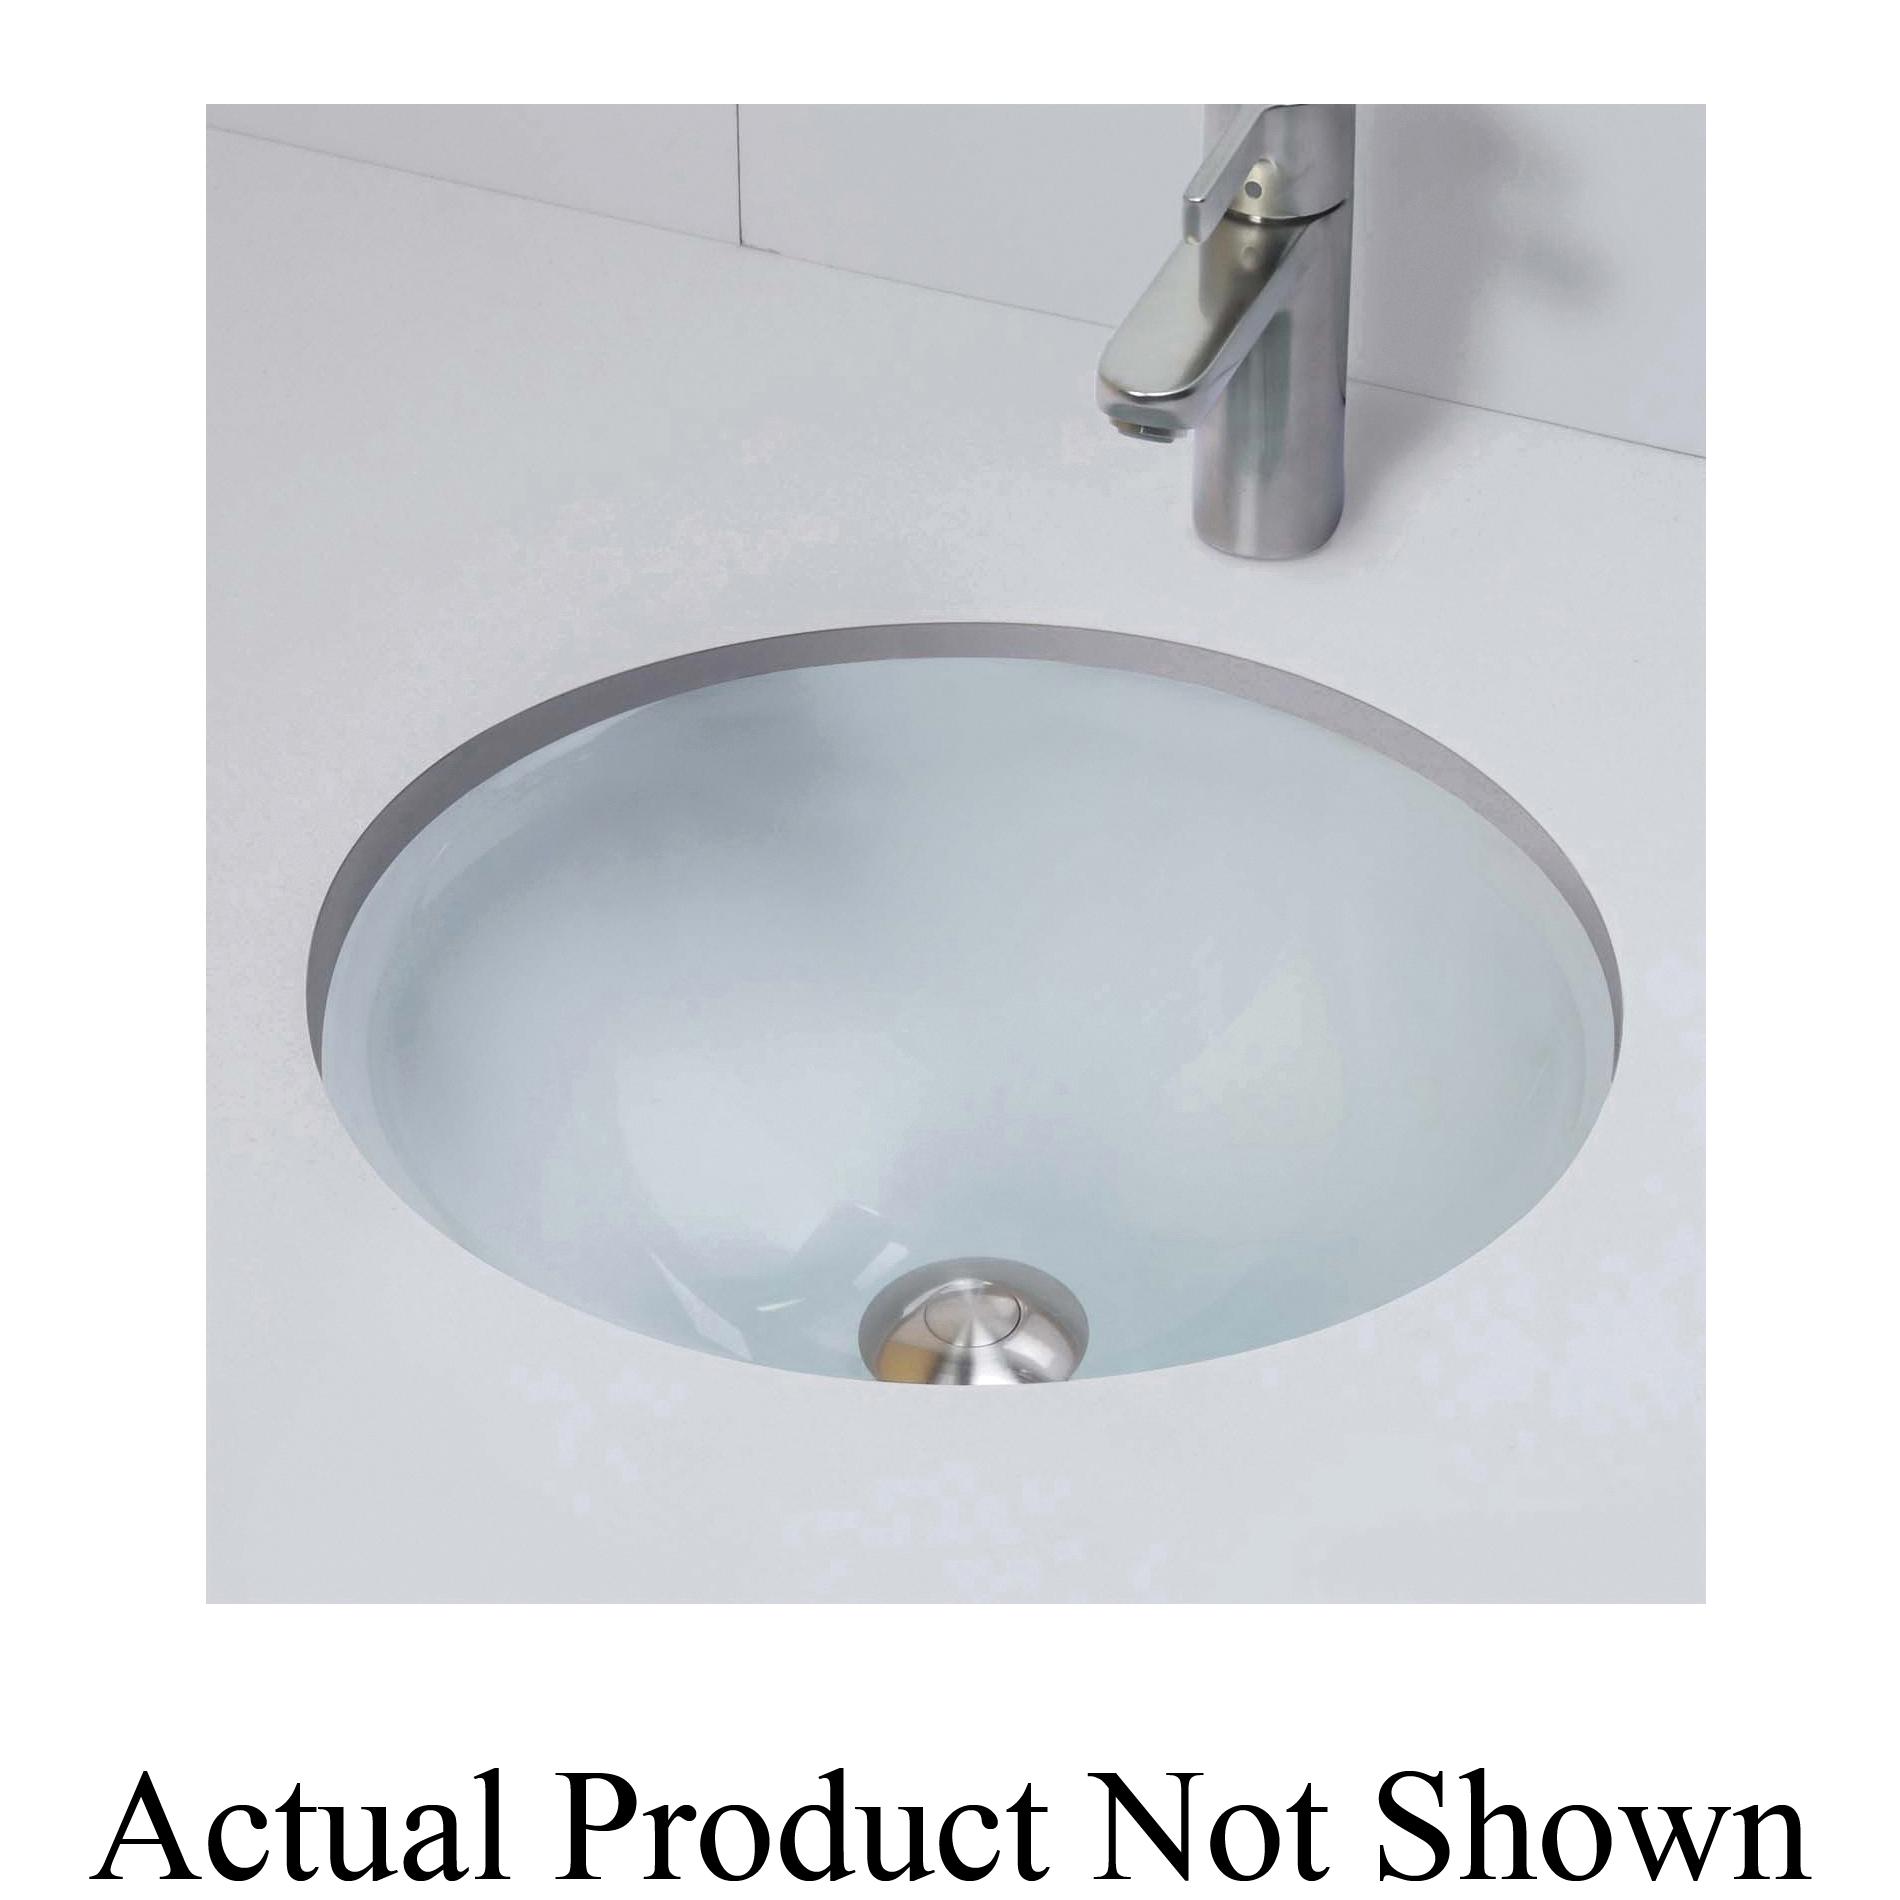 DECOLAV® 1000TU Translucence® Bathroom Sink, Round, 17.75 in W x 17.75 in D x 6.13 in H, Under Mount, Tempered Glass, Import